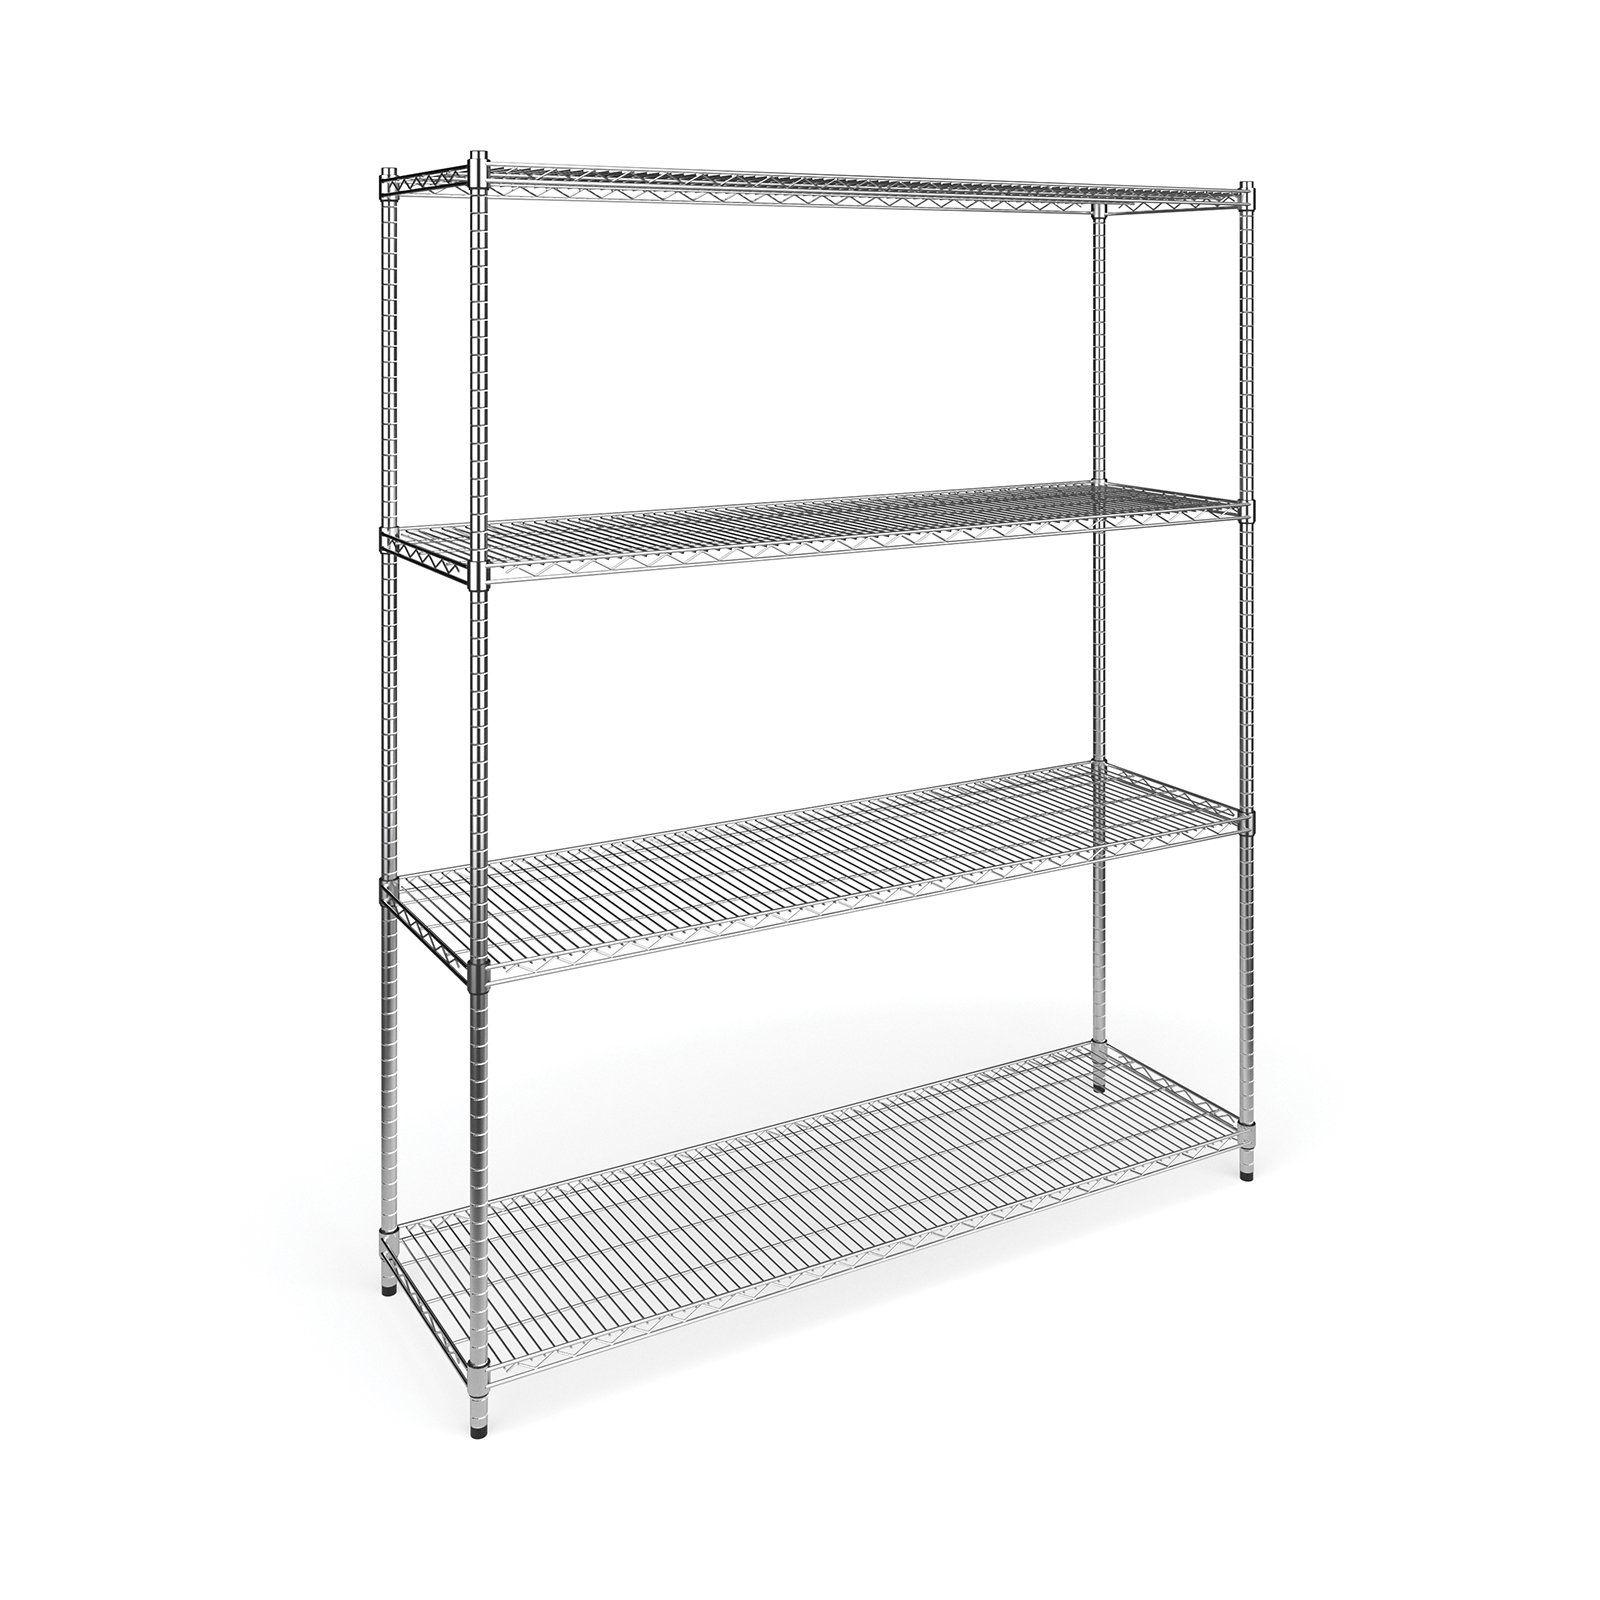 Ofm Model X5r Four Shelf Office Garage Storage Rack Ofm Garage